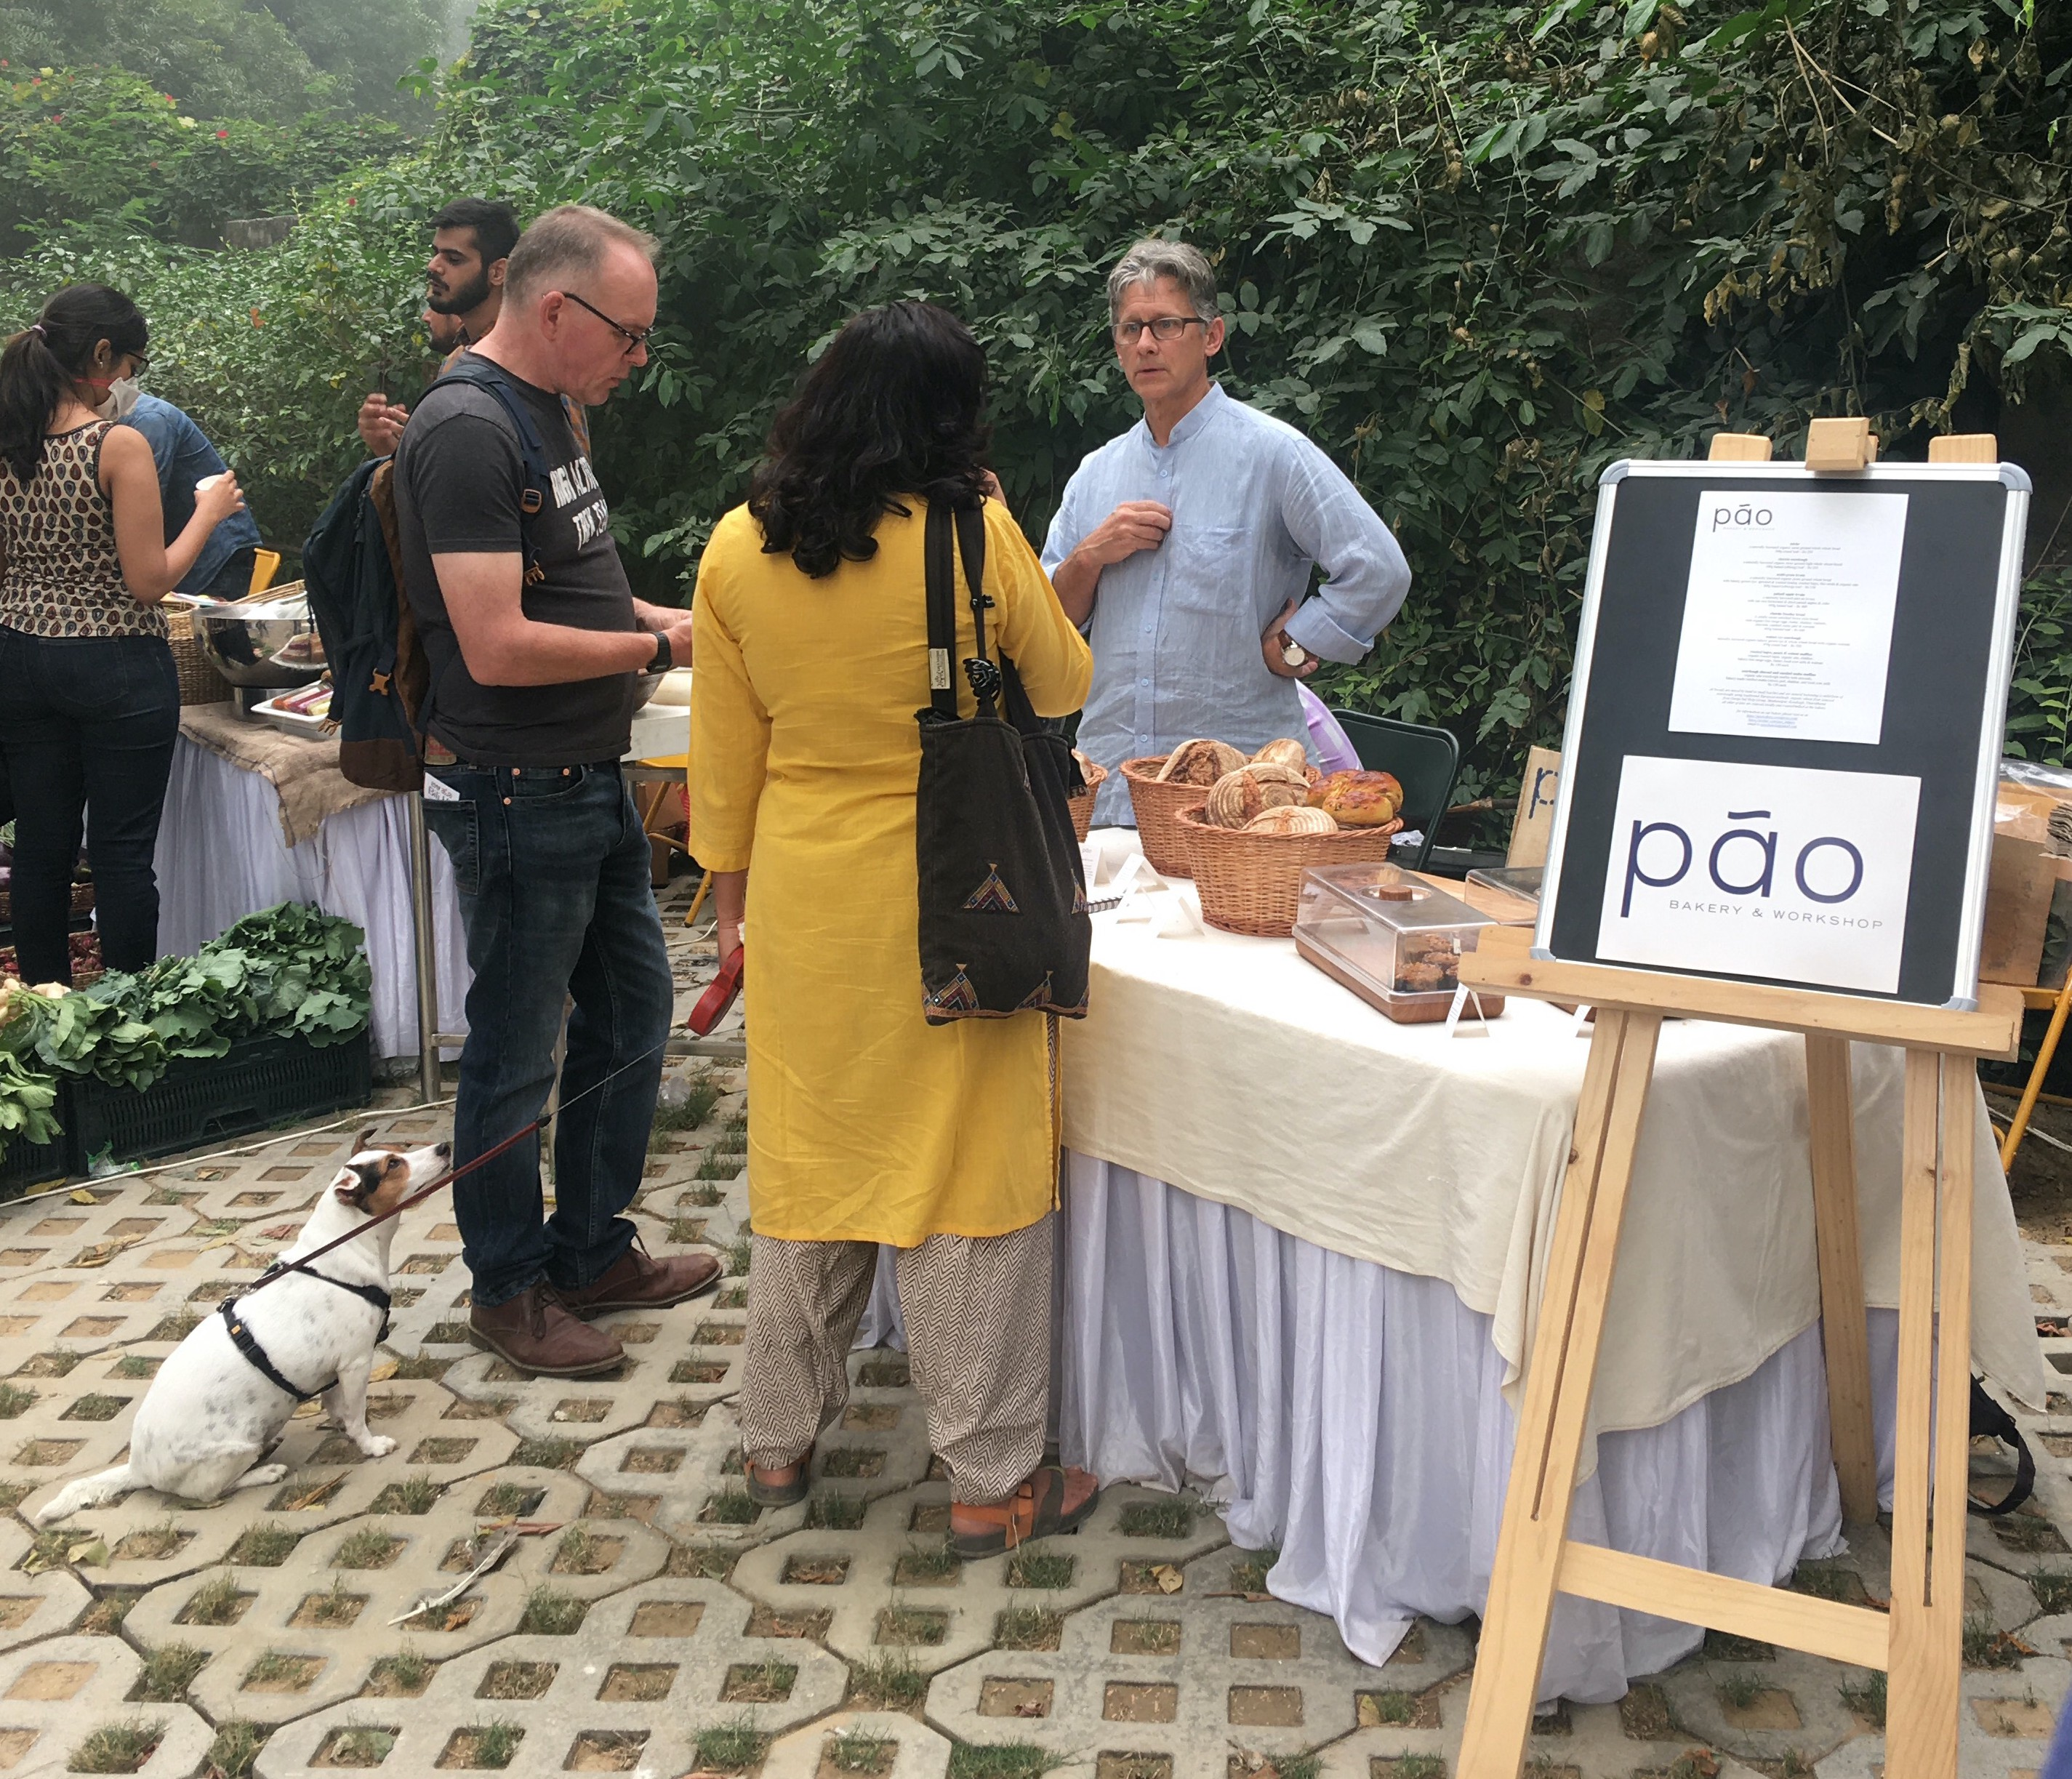 Baking artisanal revolution in India - The Shack - Medium